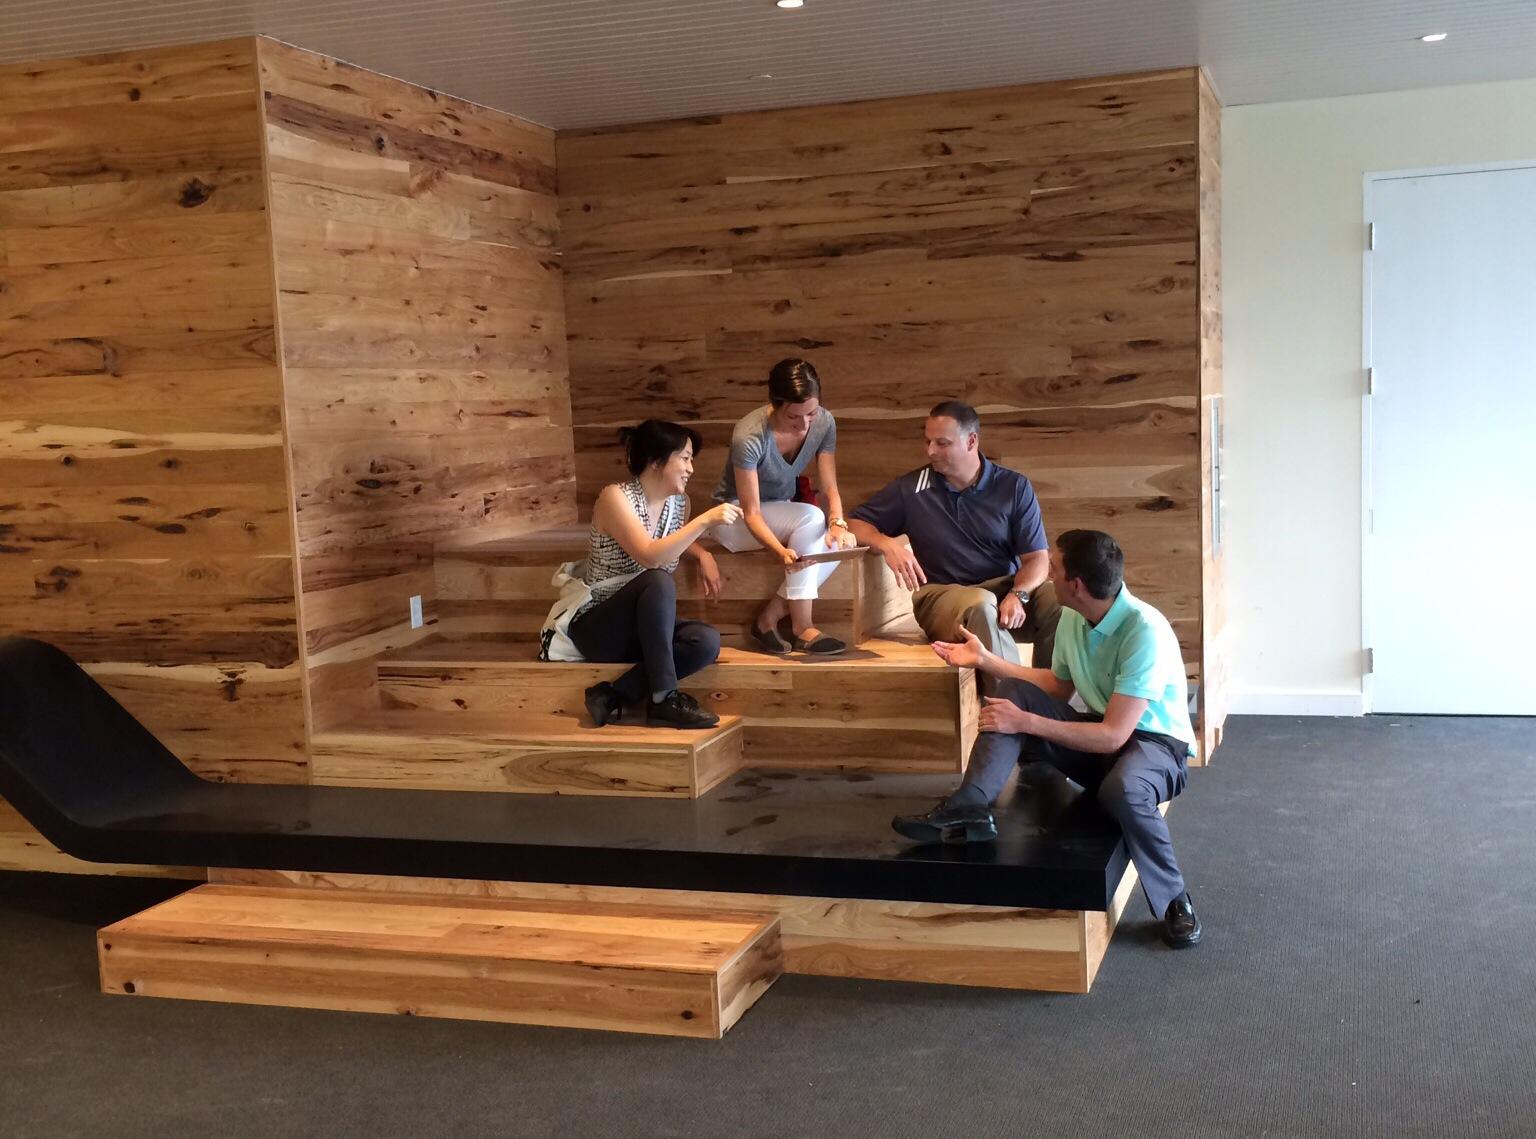 A great corner for collaboration in our design for Keurig. Image © Neil Alexander for Visnick & Caulfield